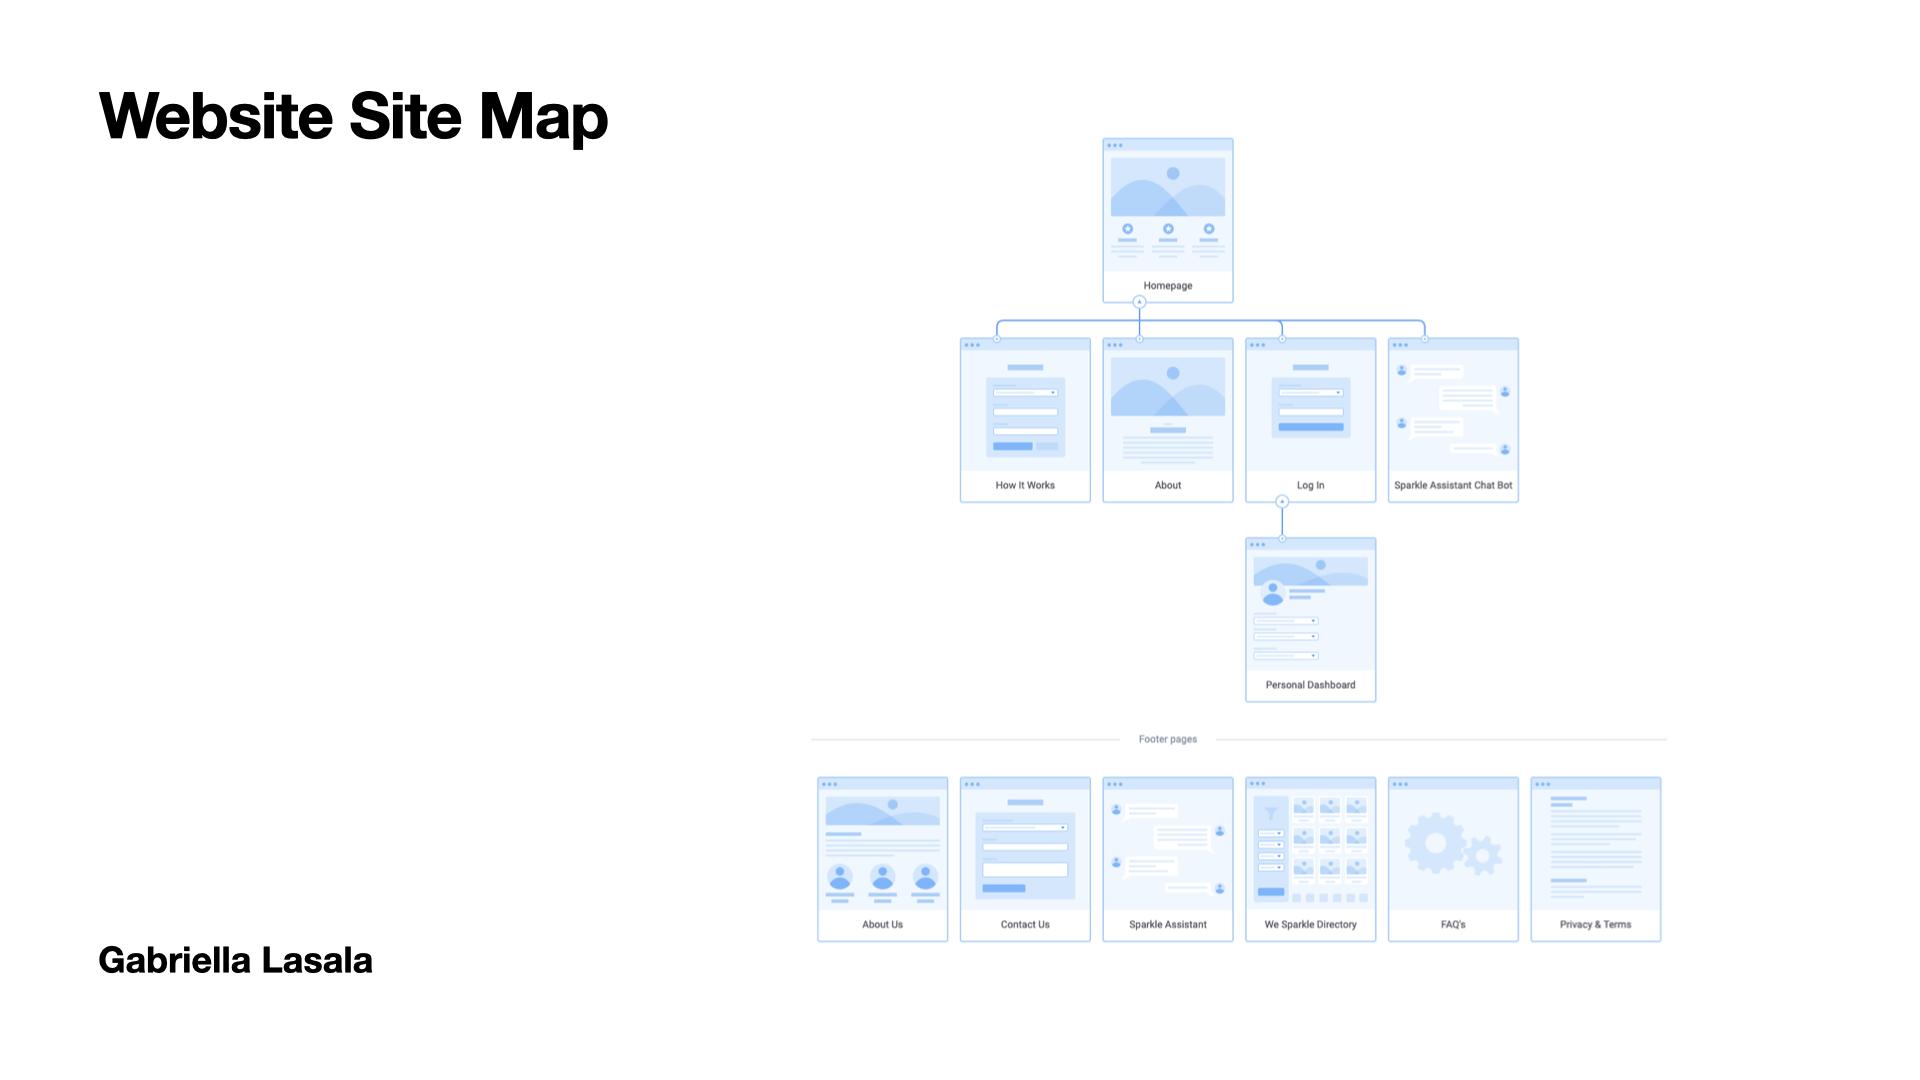 Marketing website site map proposal.